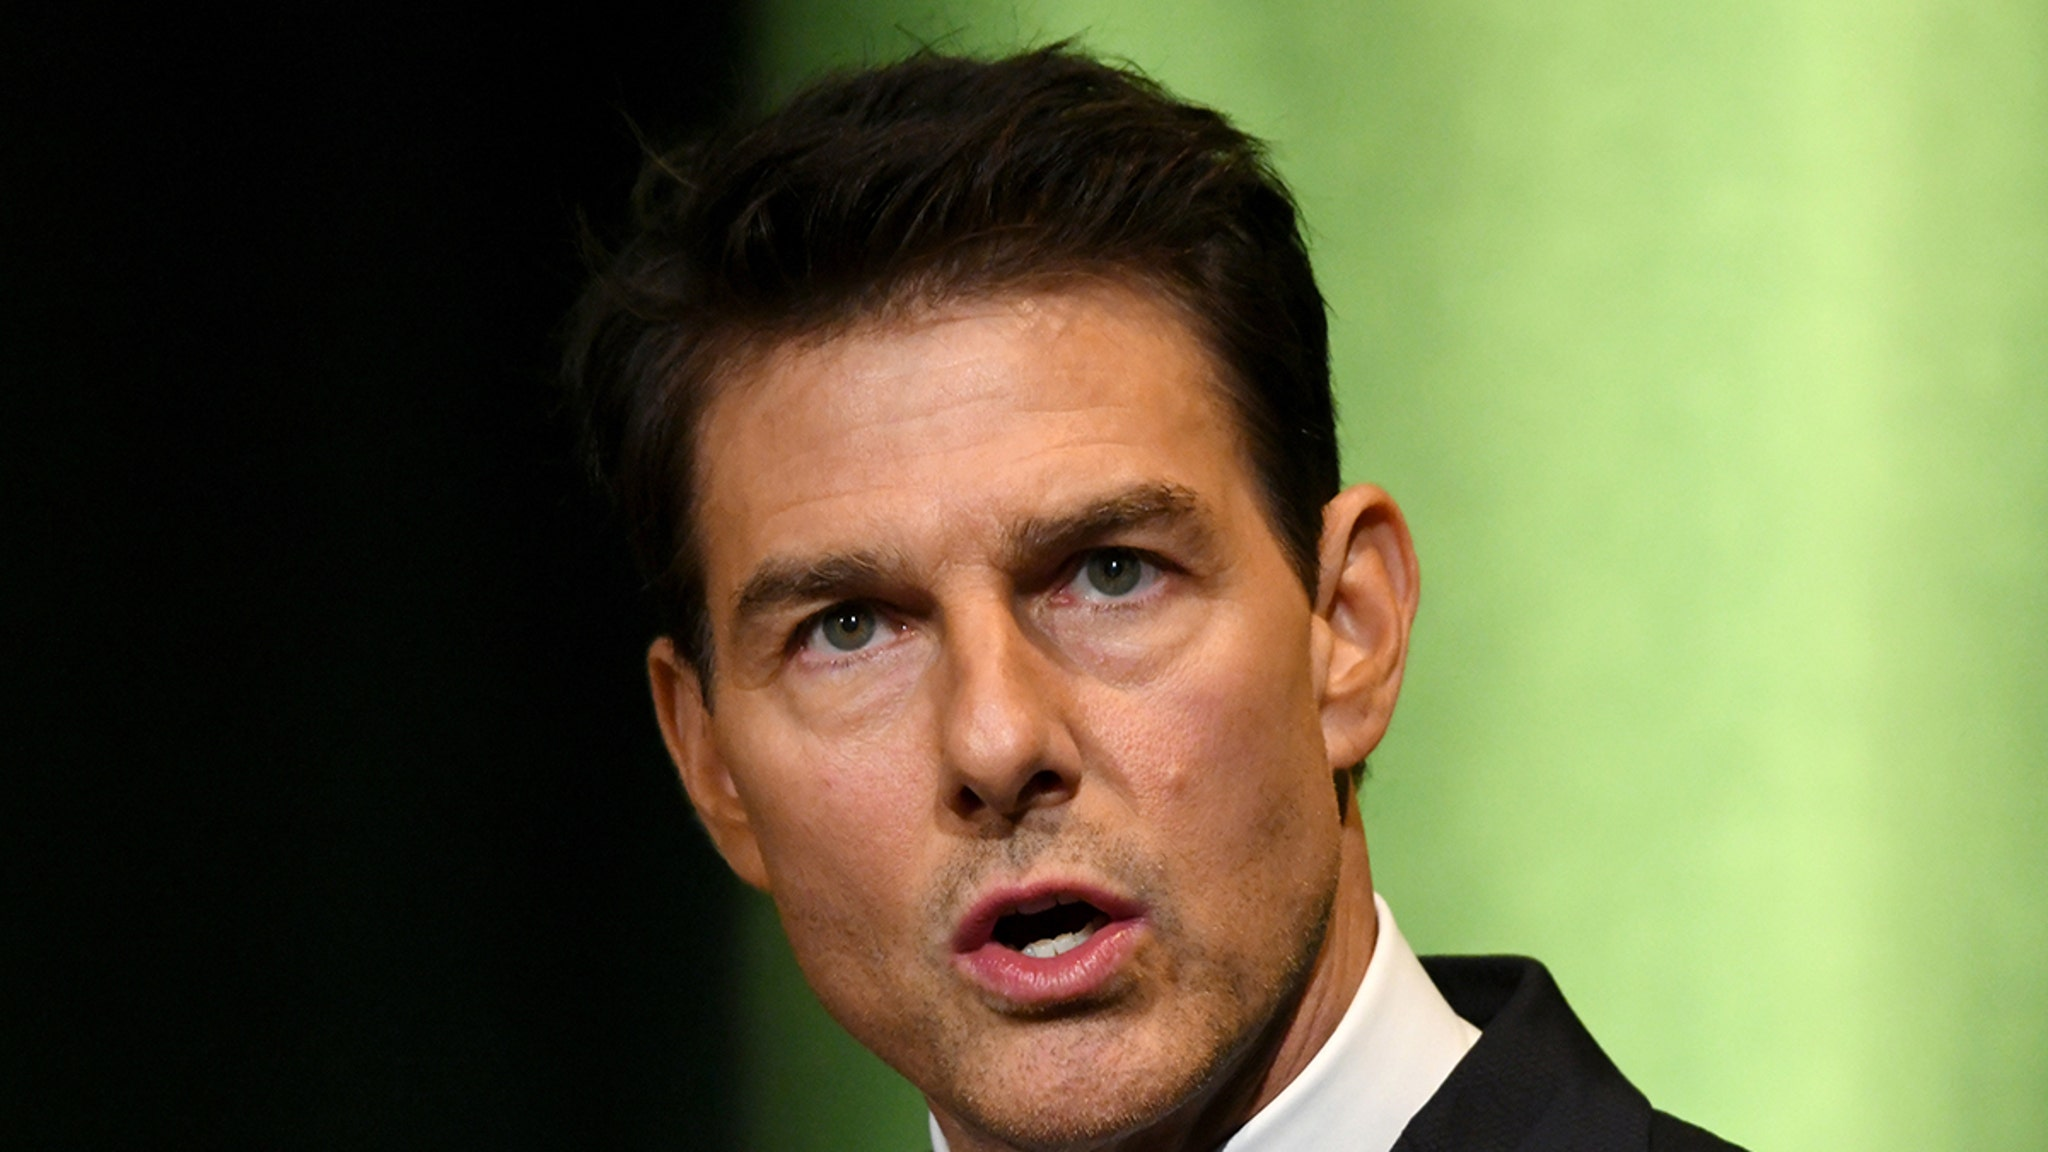 Tom Cruise Raging tirade on 'M.I' Set in U.K. ... Crew Got within 6 Feet